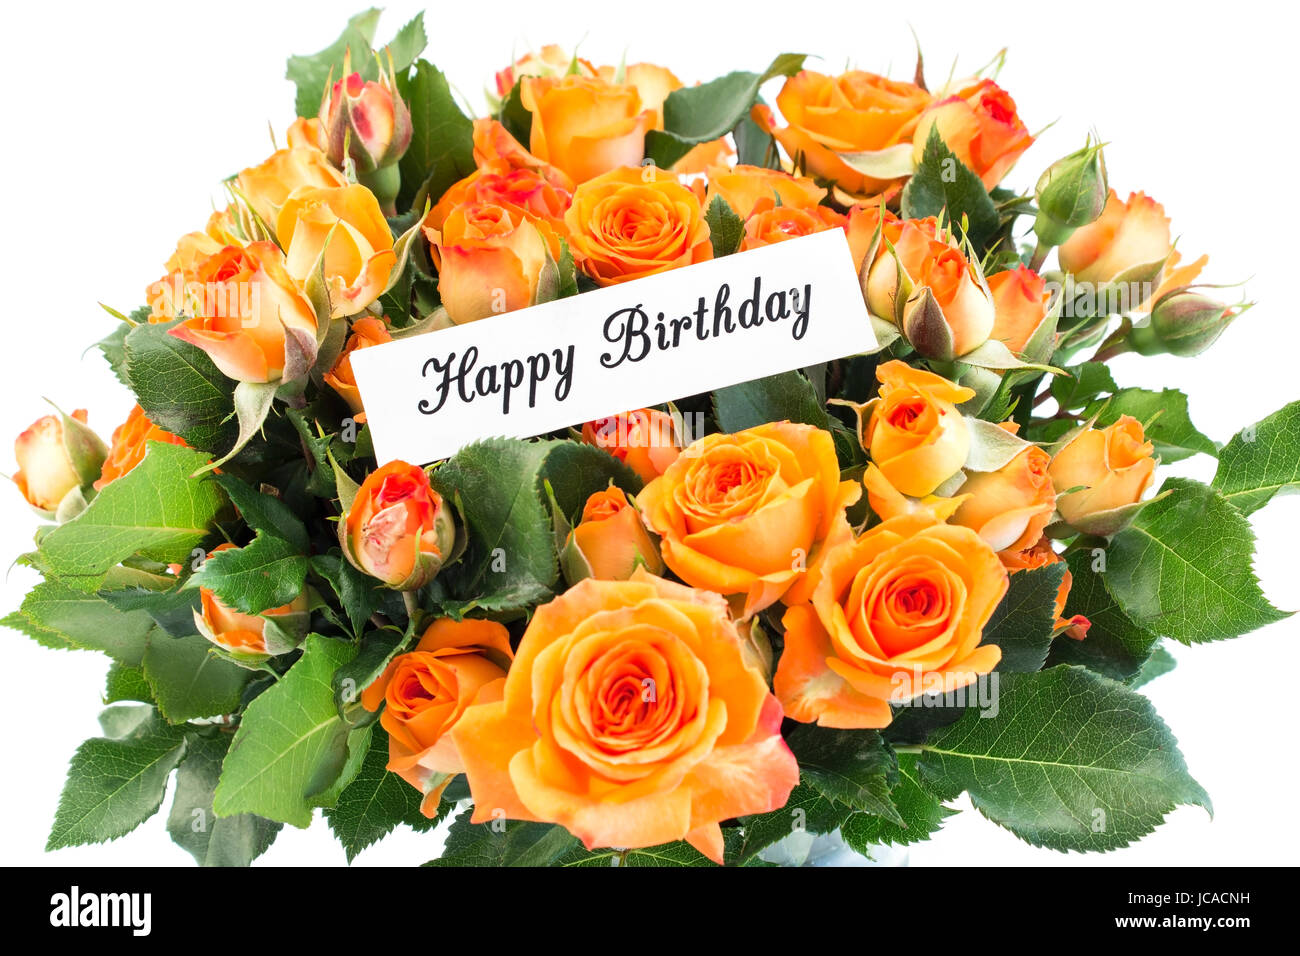 Happy birthday card with bouquet of orange roses on white background happy birthday card with bouquet of orange roses on white background izmirmasajfo